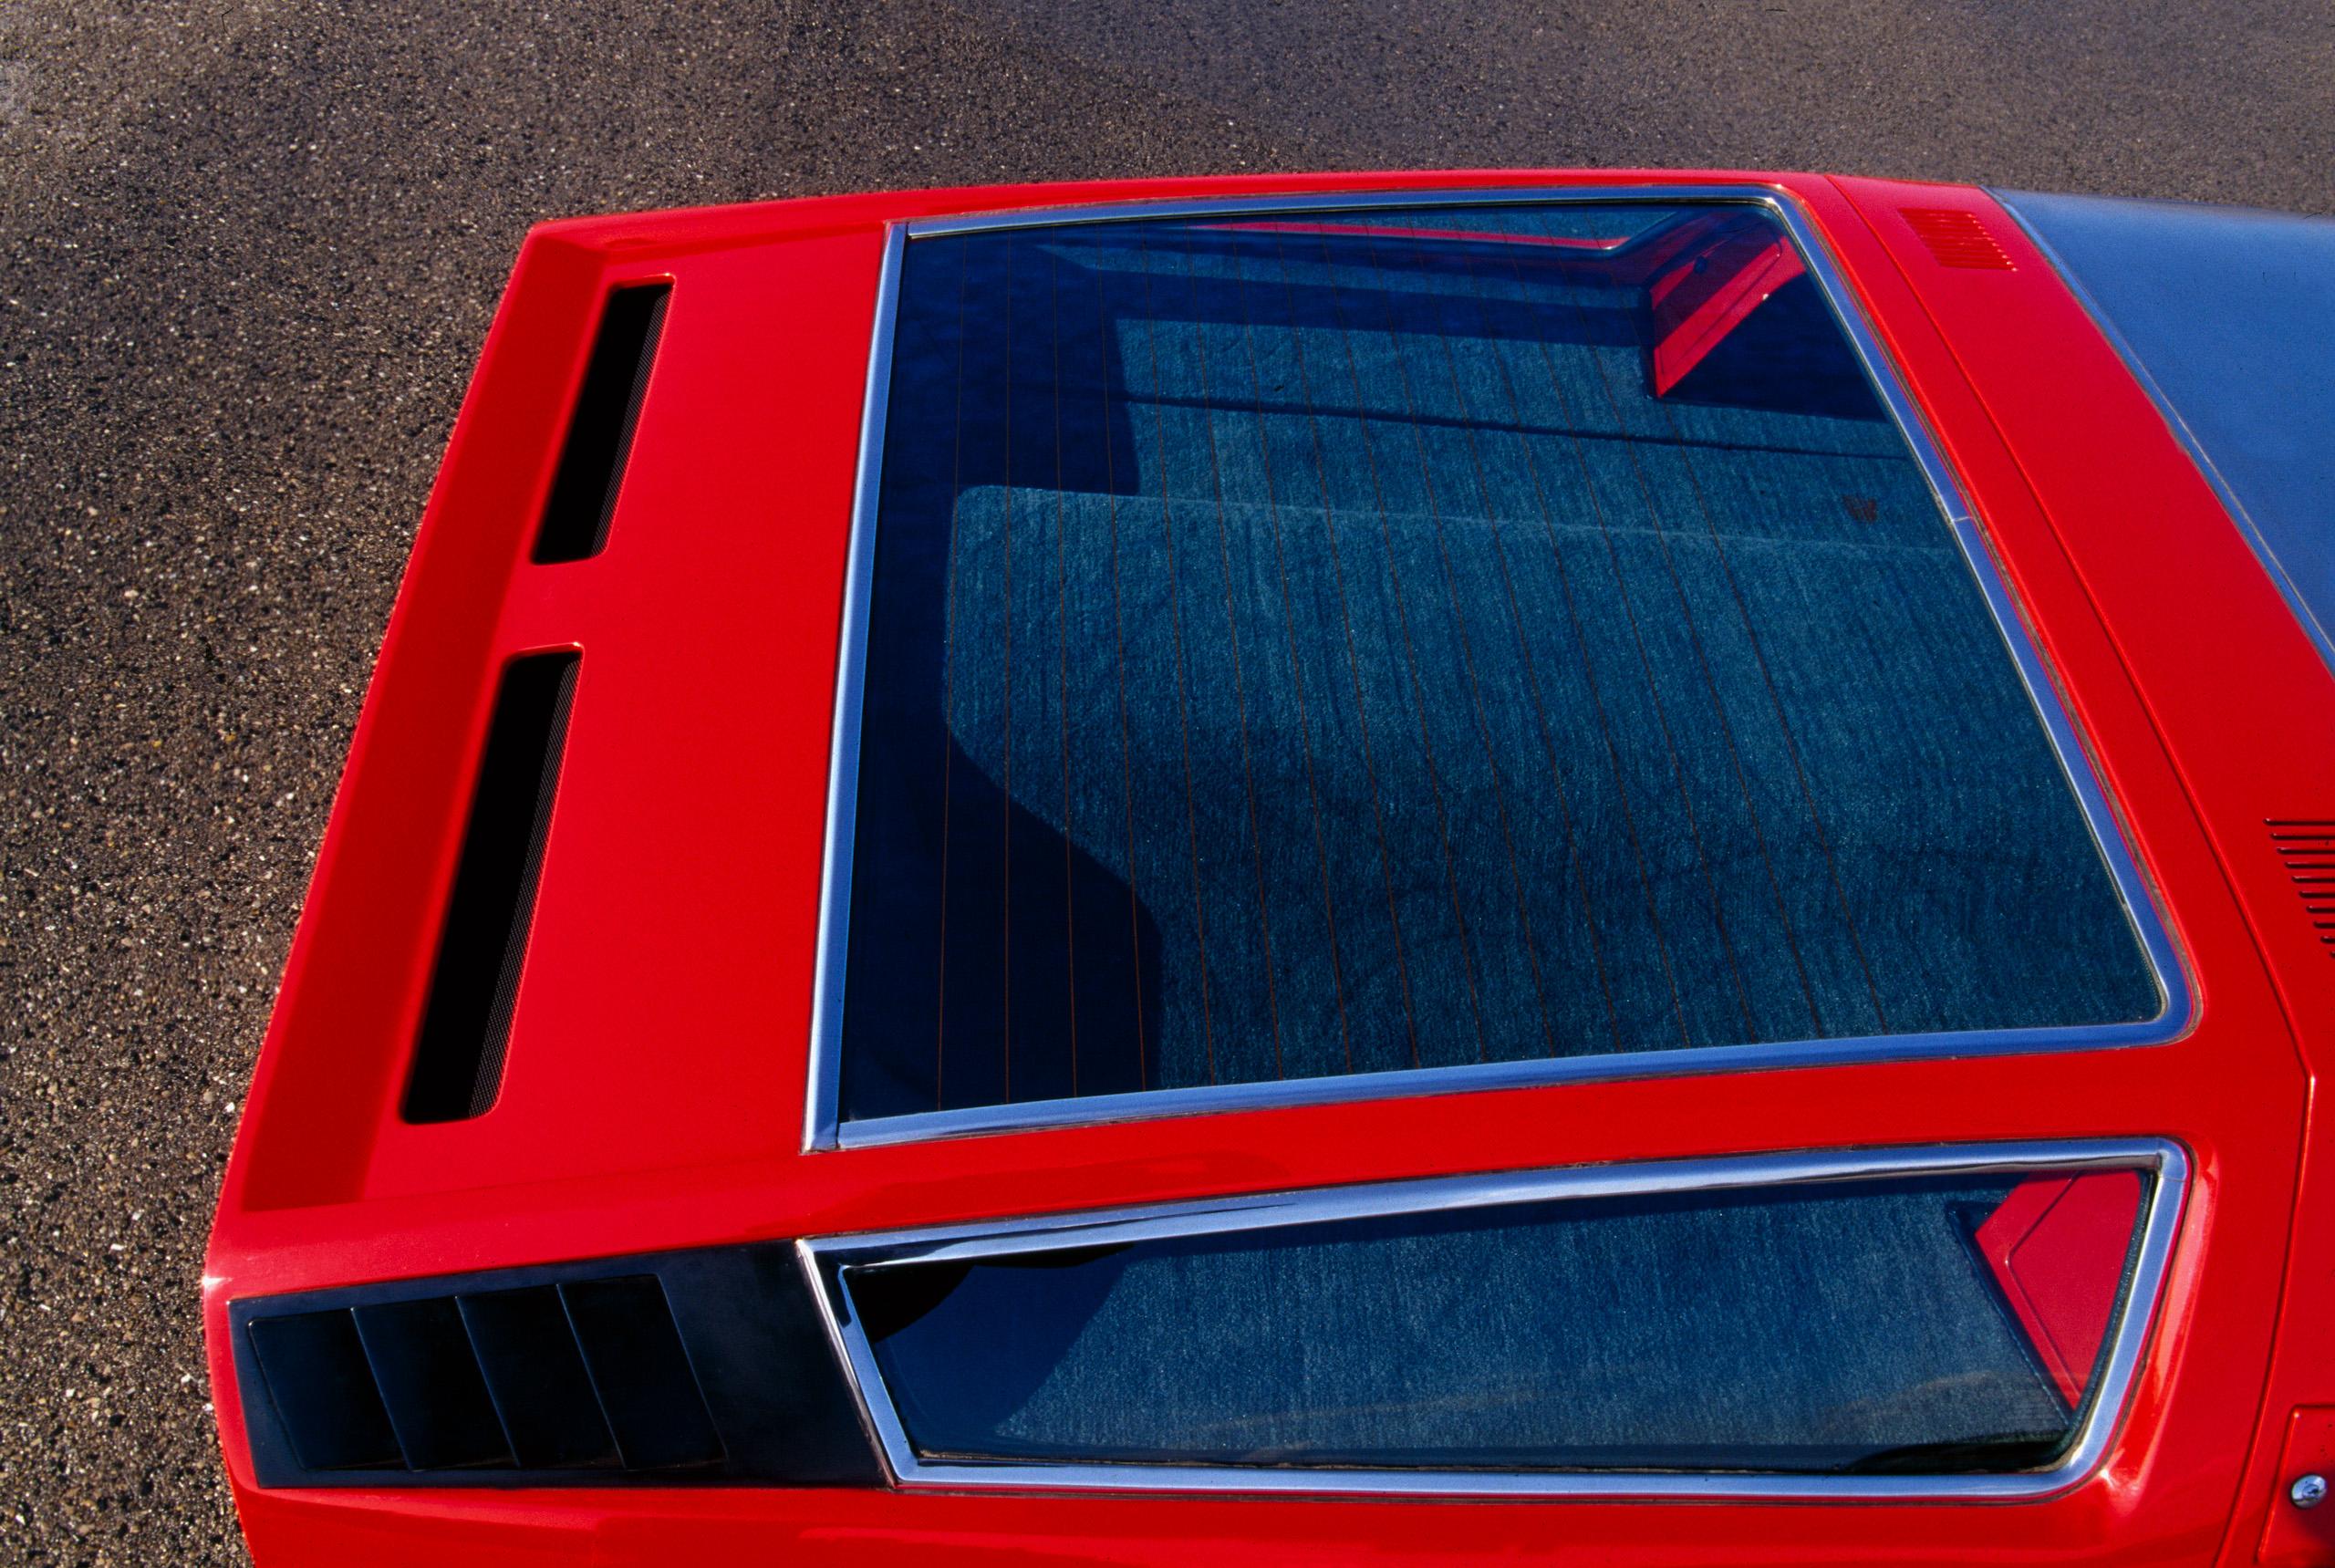 Maserati Bora rear window glass